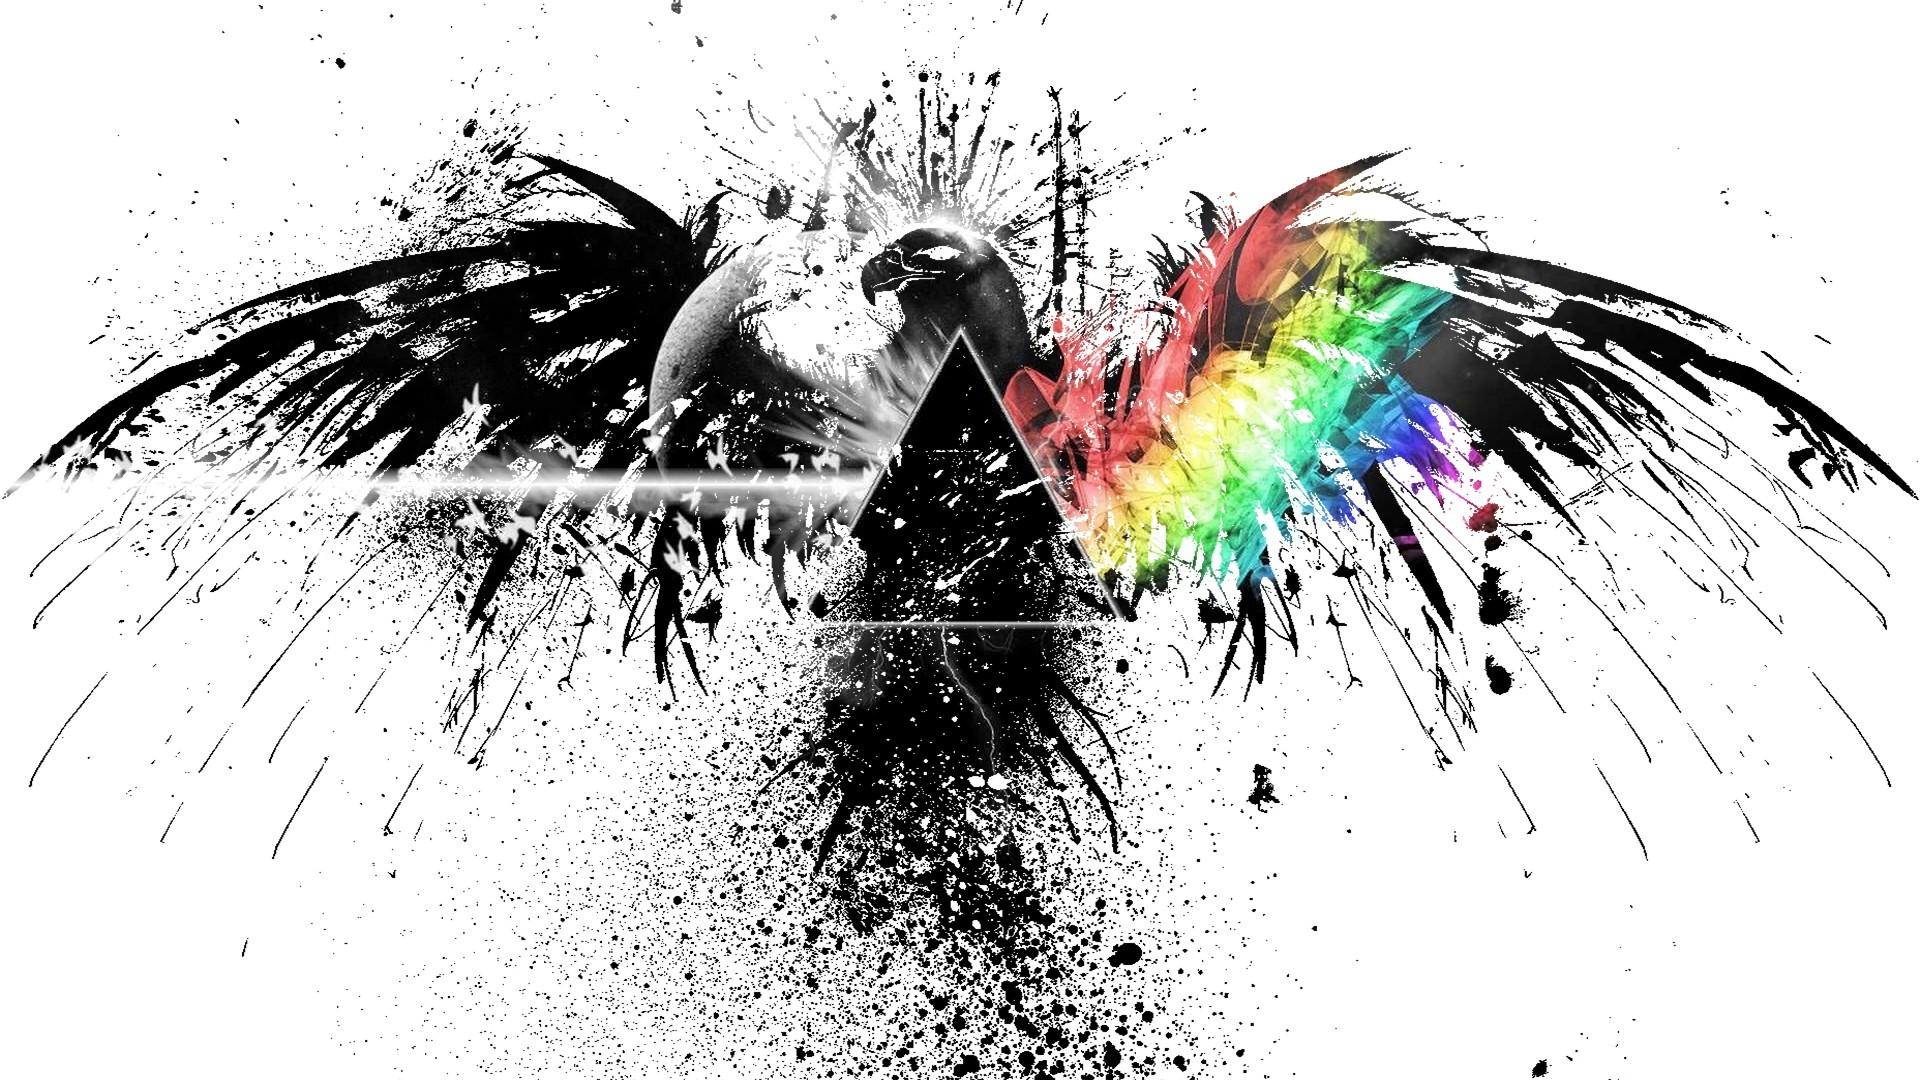 pink floyd black and white rainbow eagle graffiti spray